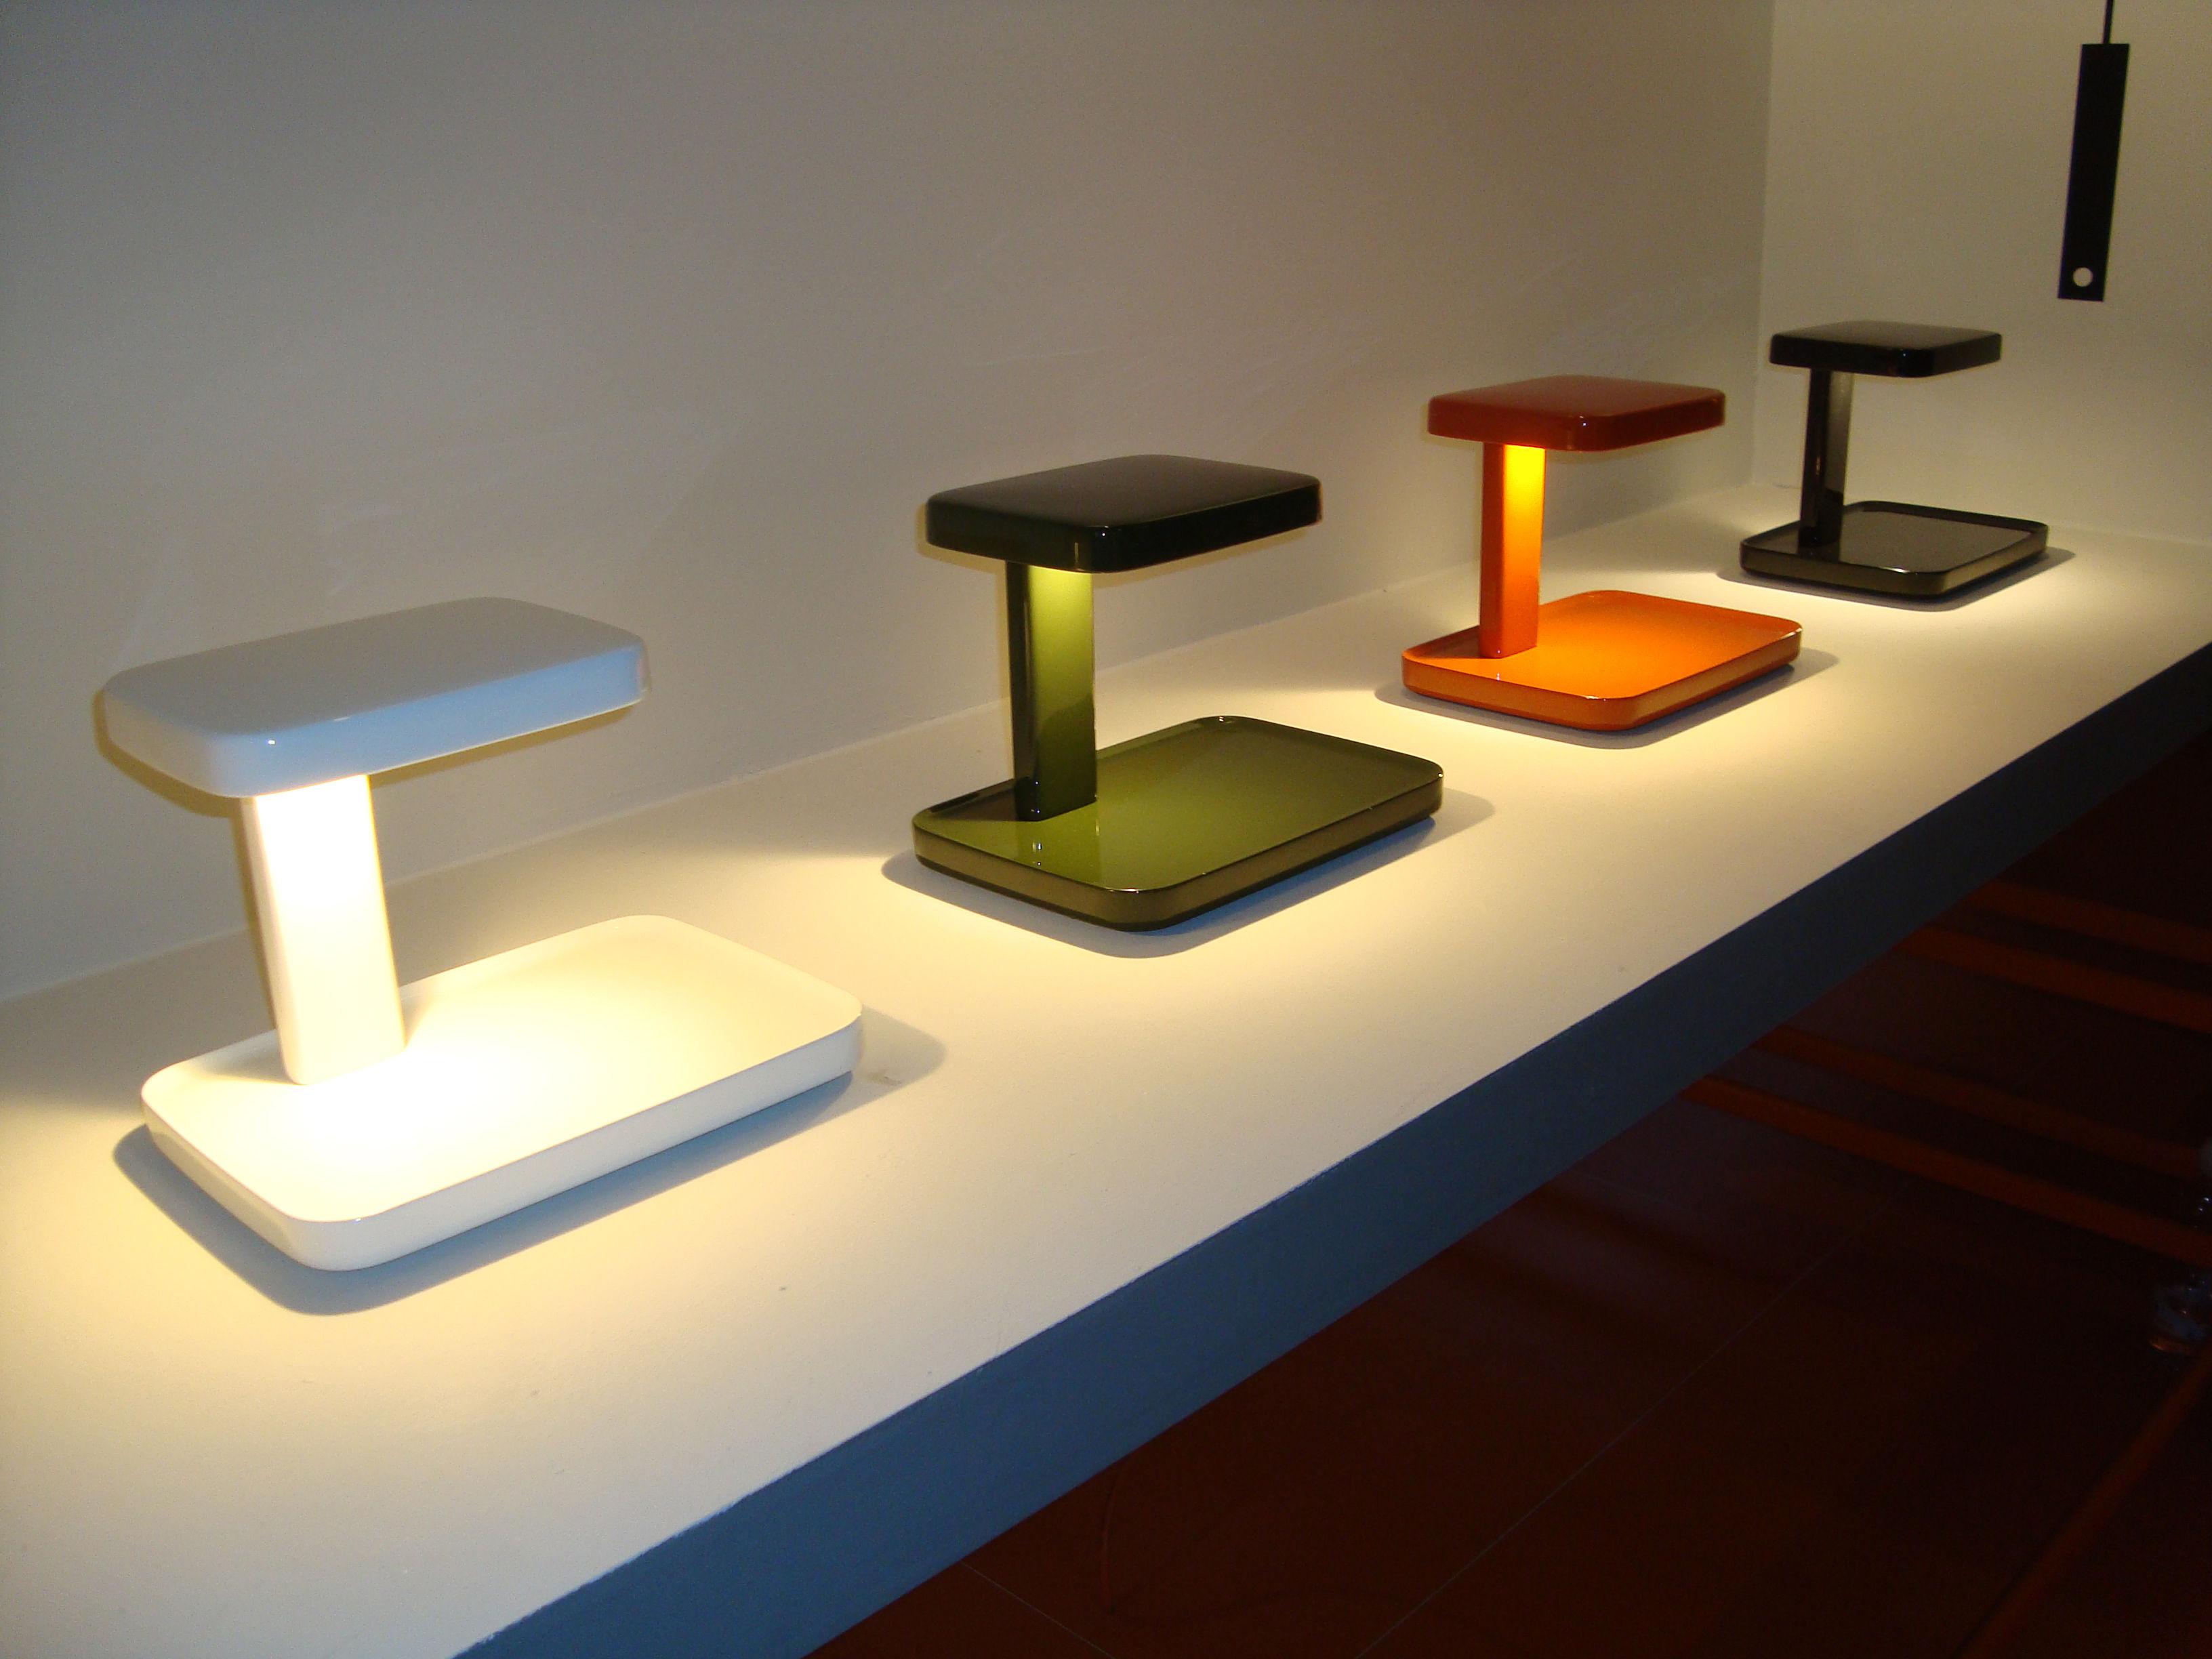 Lampade Da Tavolo Flos : Lampada da tavolo piani flos verde l 26.4 x l 18.3 x h 20 made